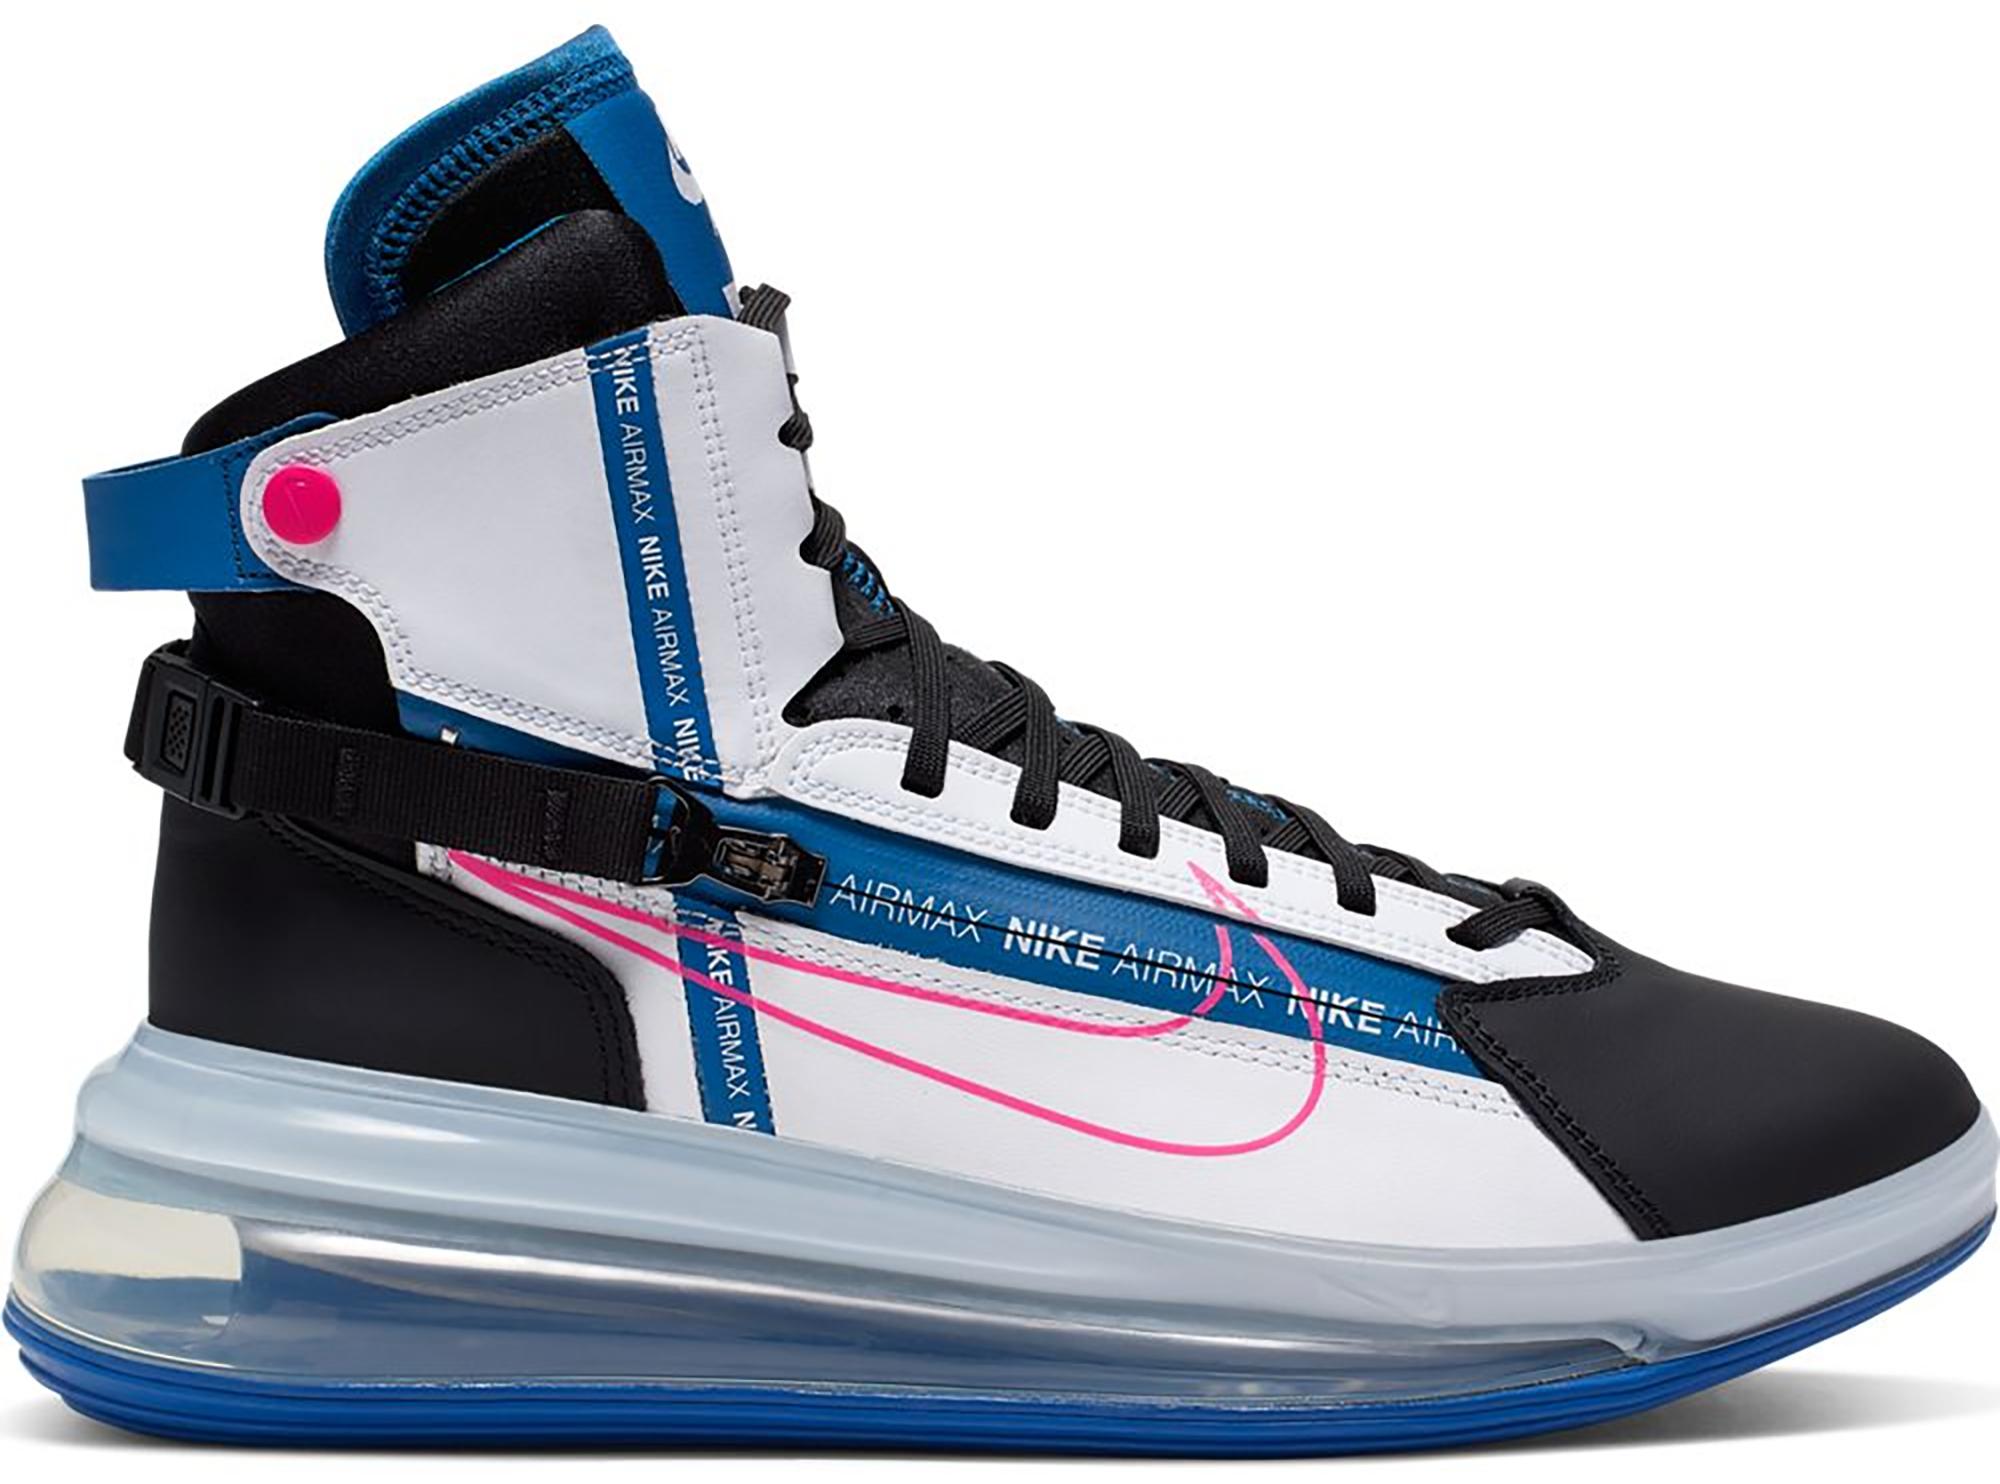 Nike Air Max 720 Strn Black Blue Pink